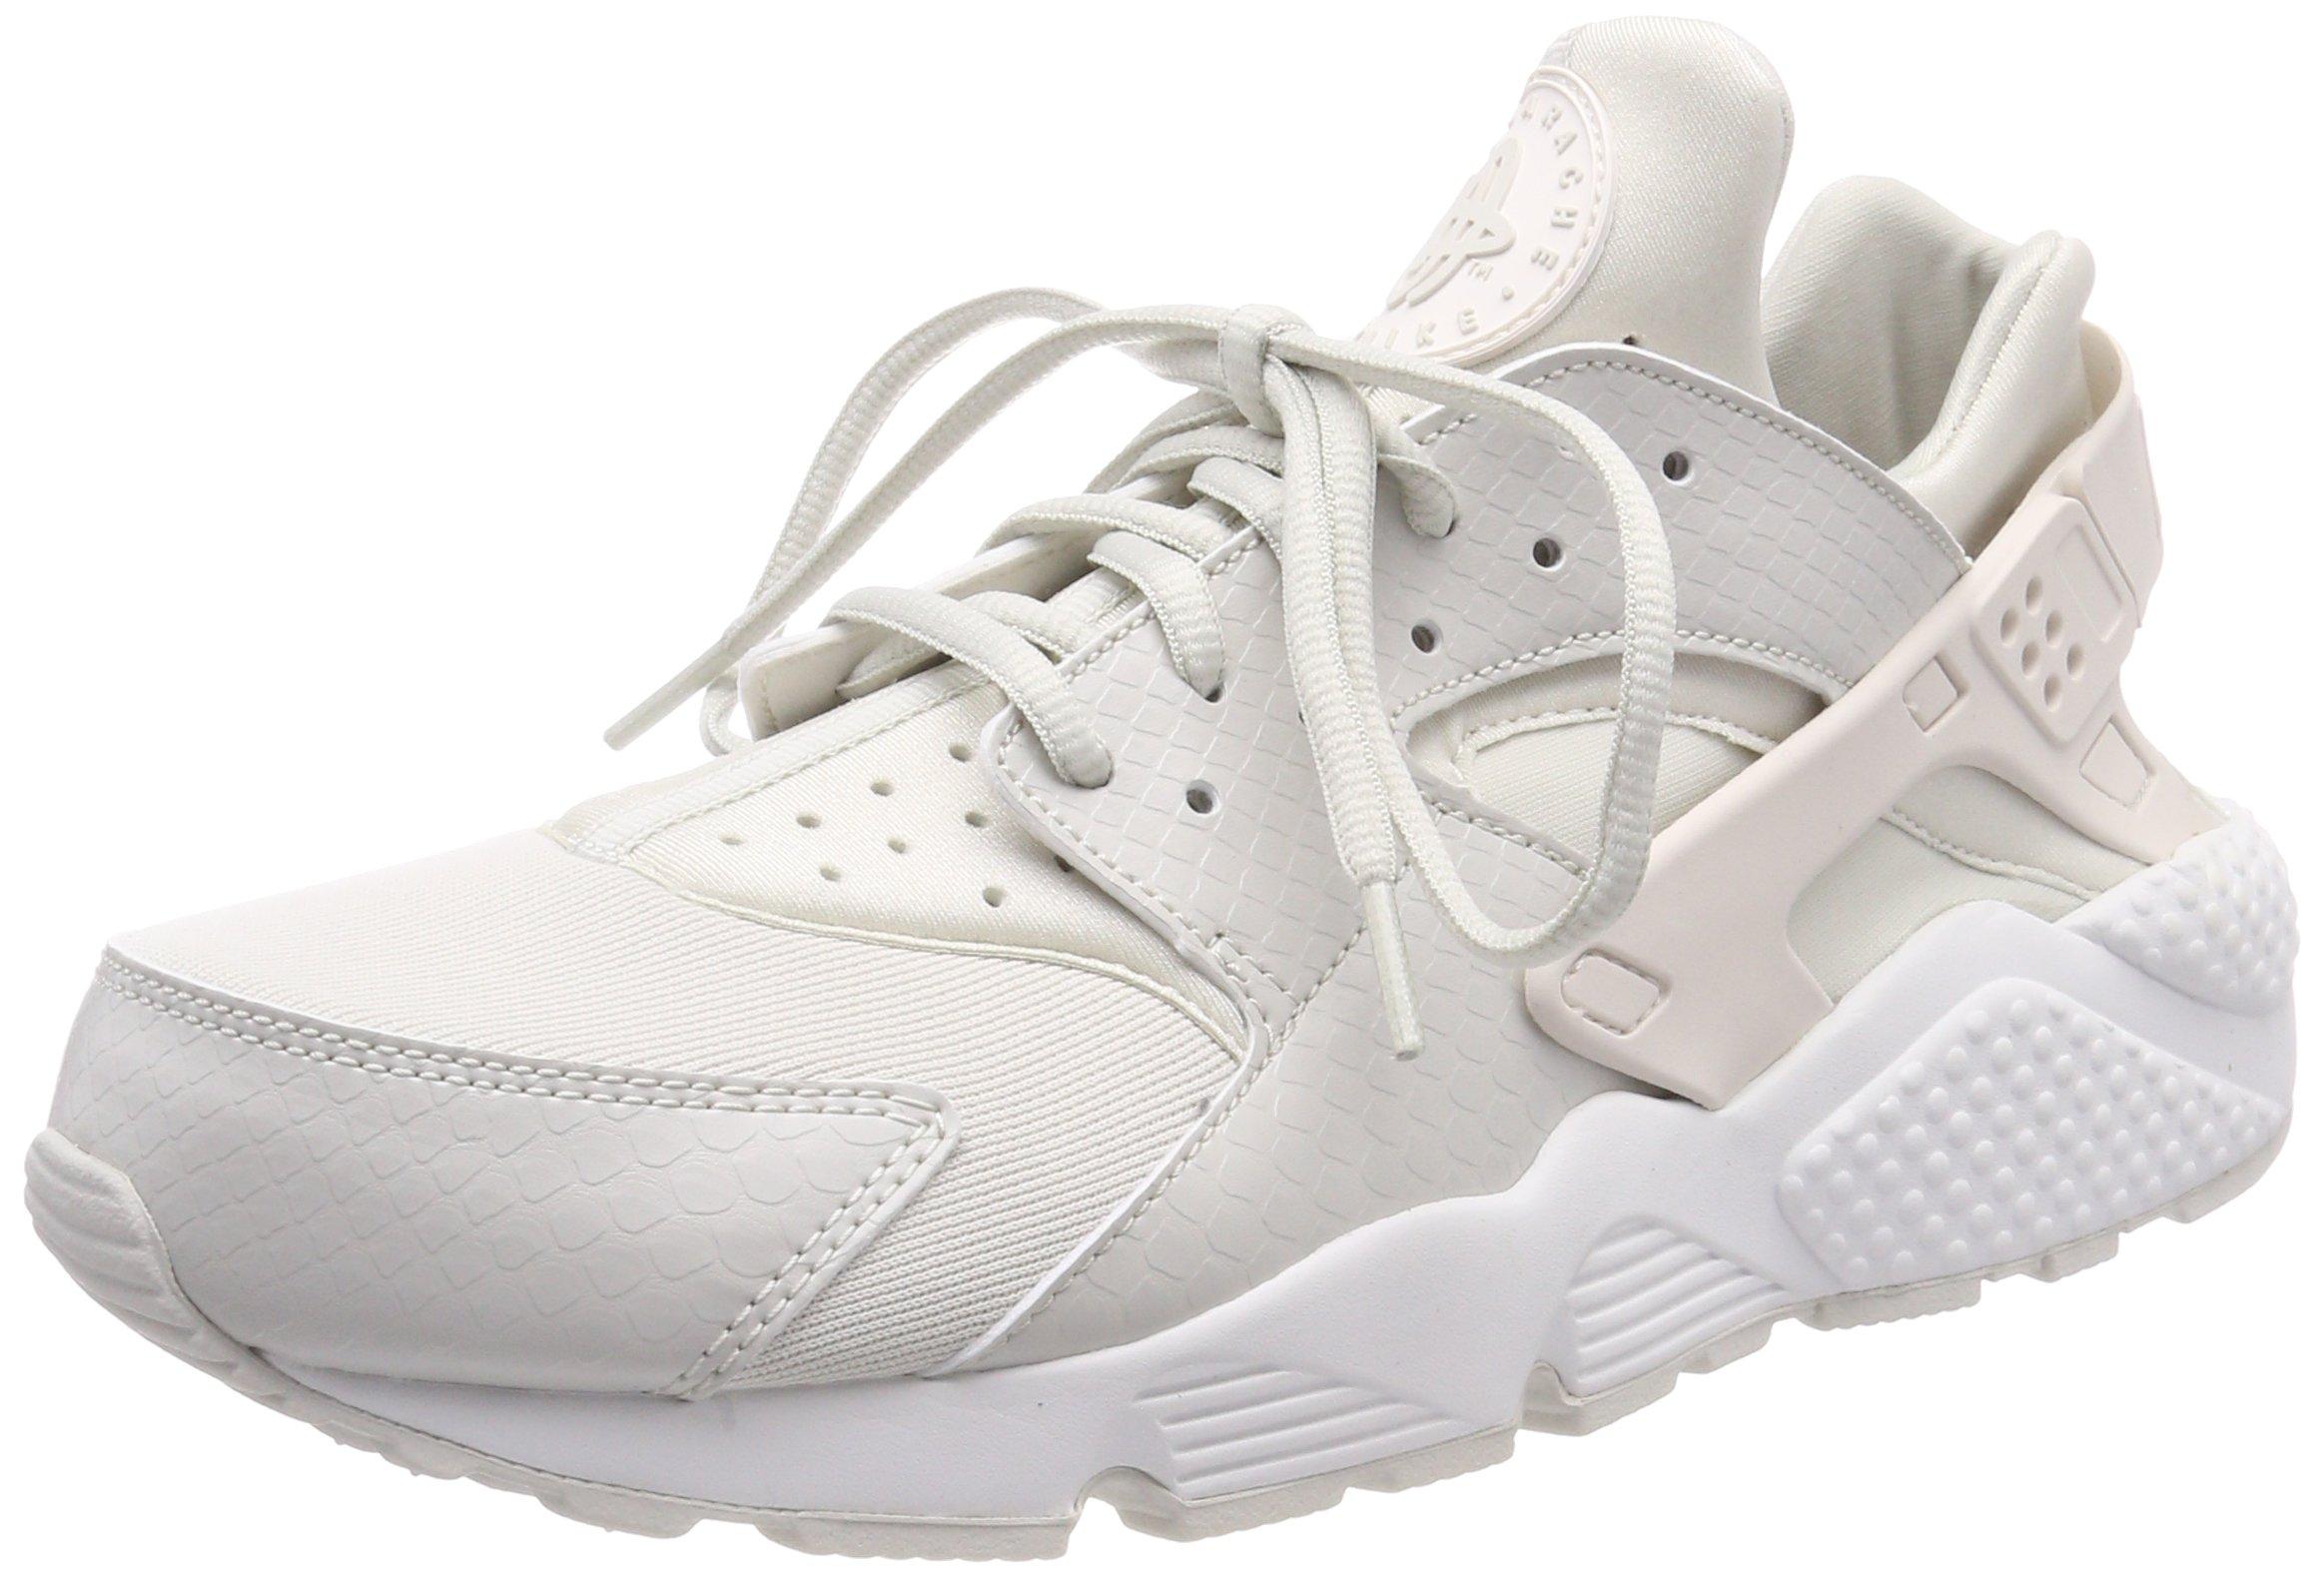 on sale 32661 a7a1e Galleon - Nike Women s Air Huarache Run Fitness Shoes, Multicolour  (Phantom Light Bone-S 028), 9.5 UK